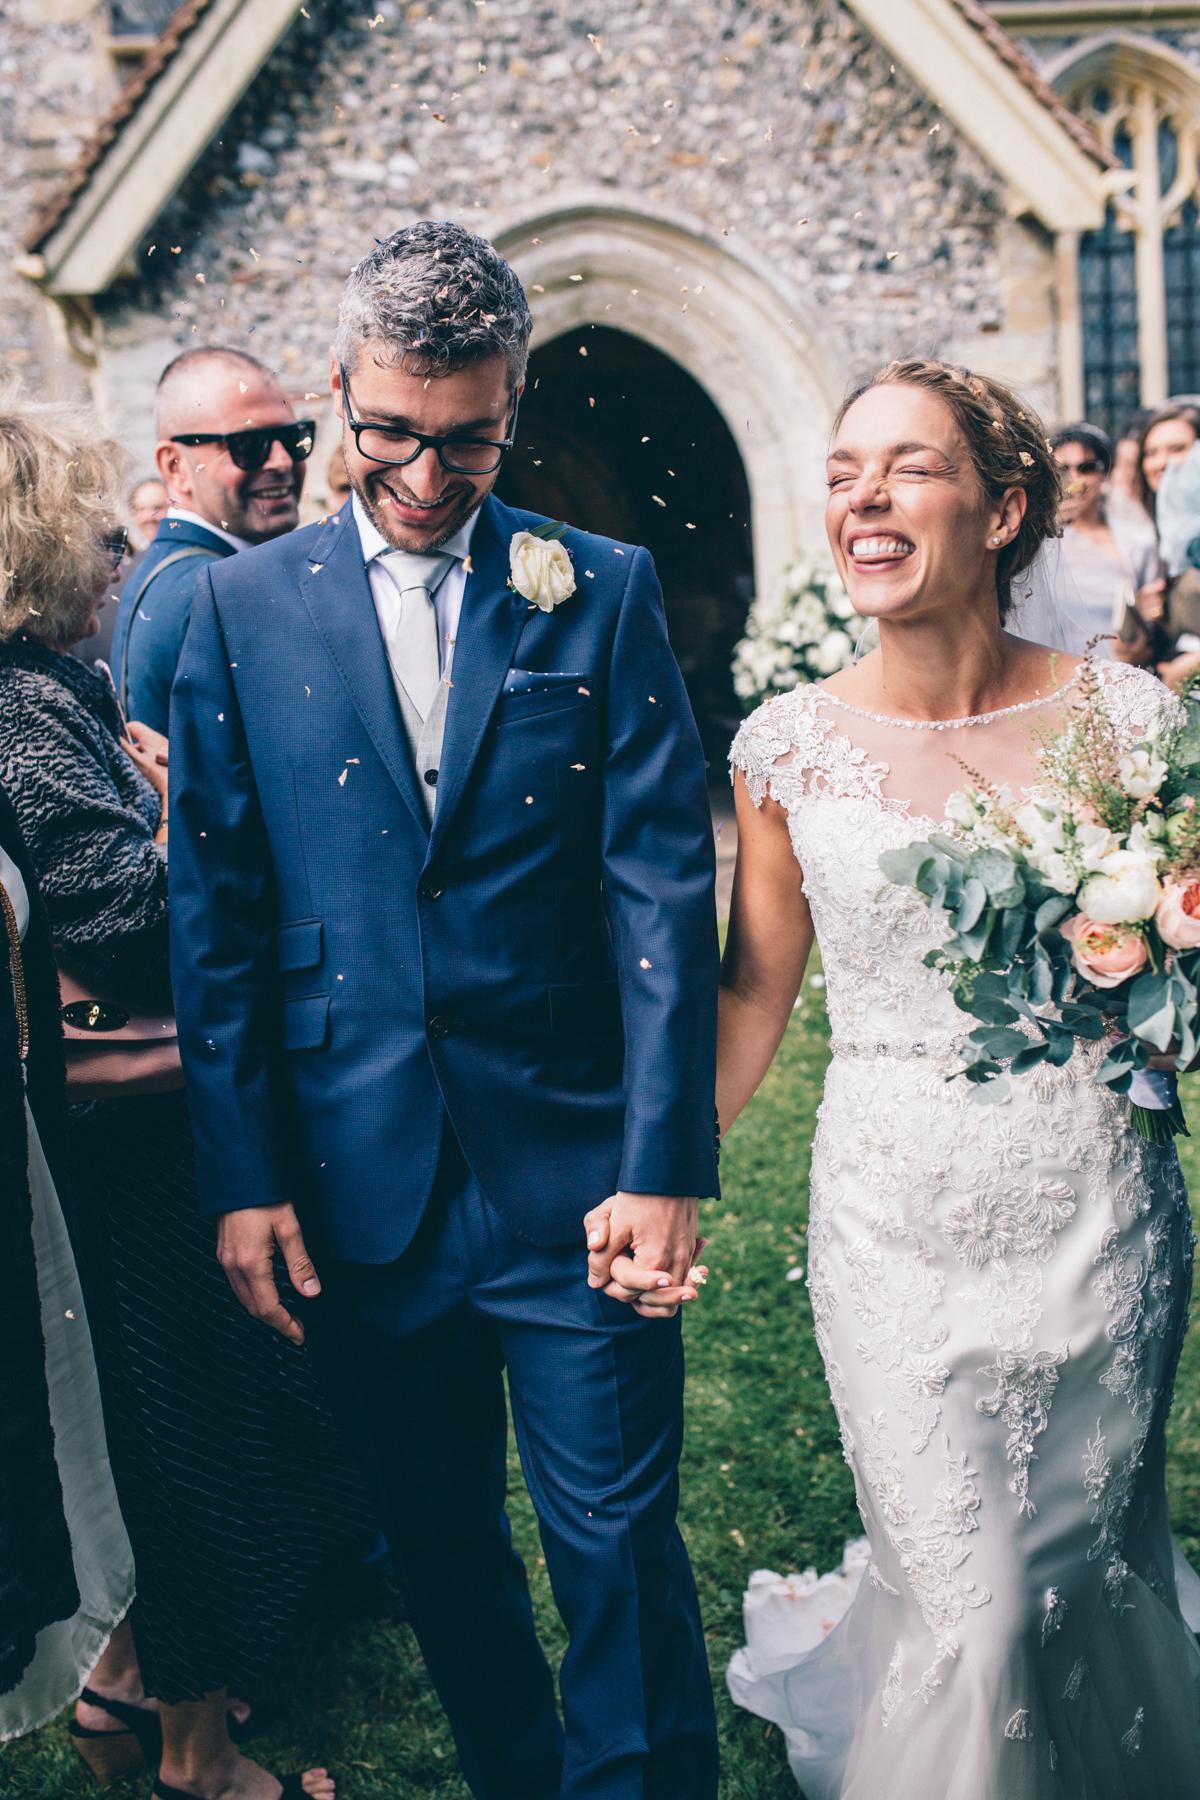 Sarah + Caco Tipi Village Green Wedding Buckinghamshire NaomiJanePhotography-53.jpg